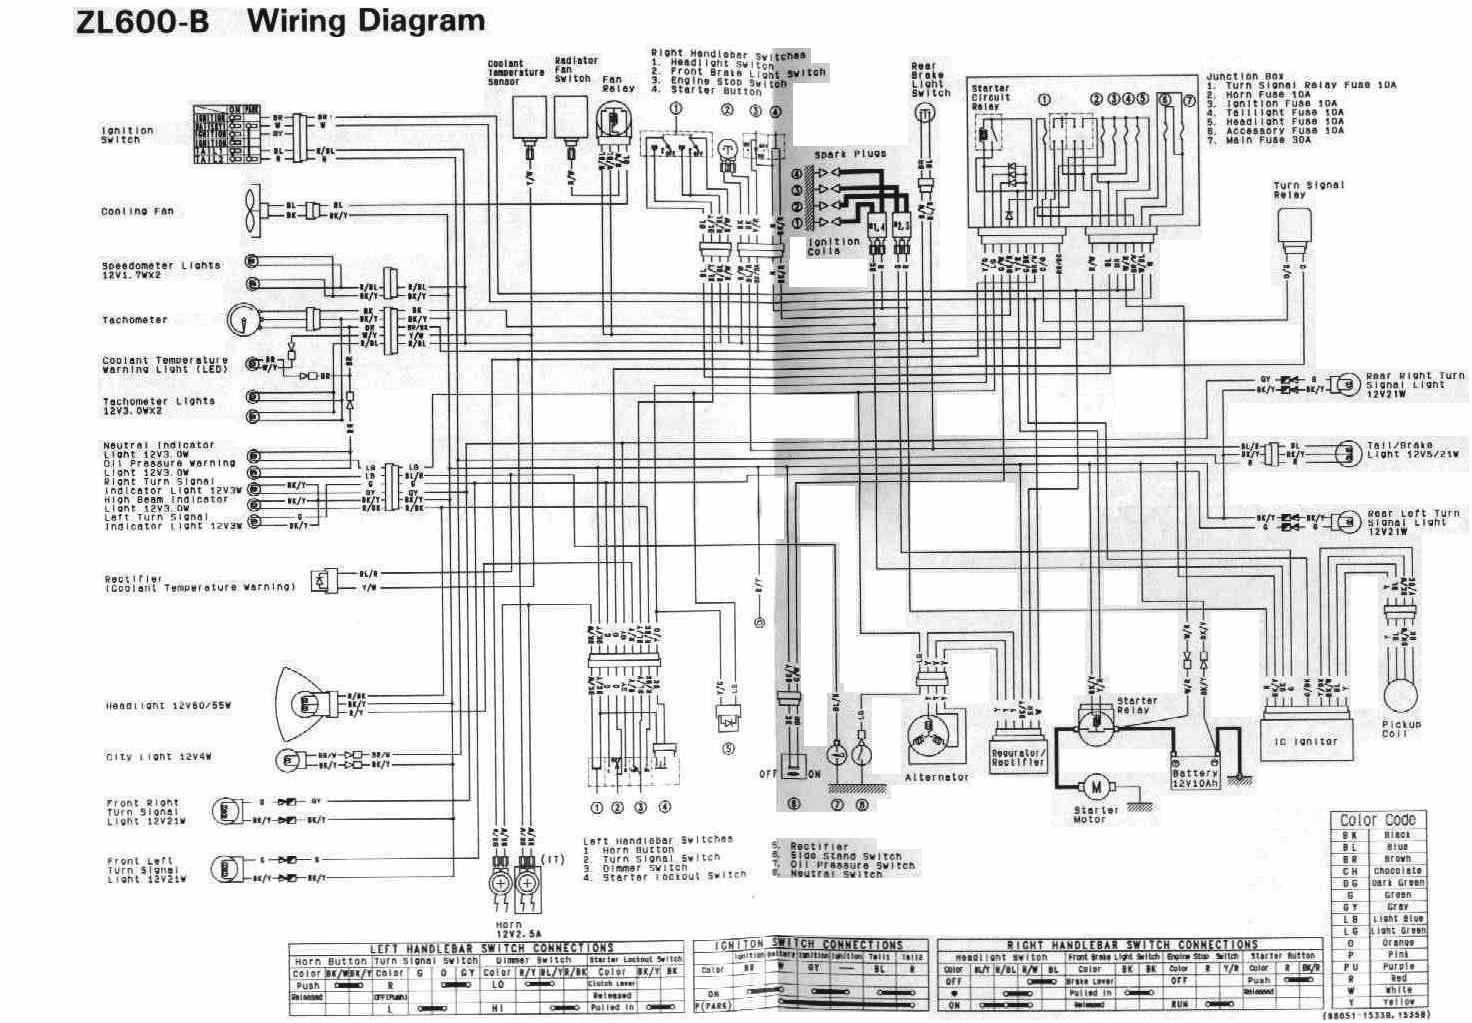 OB_1254] 250 Wiring Diagram Moreover Kawasaki Ninja 250 Ignition Wiring  Diagram Download DiagramBirdem Eachi Winn Usnes Oper Wigeg Mohammedshrine Librar Wiring 101